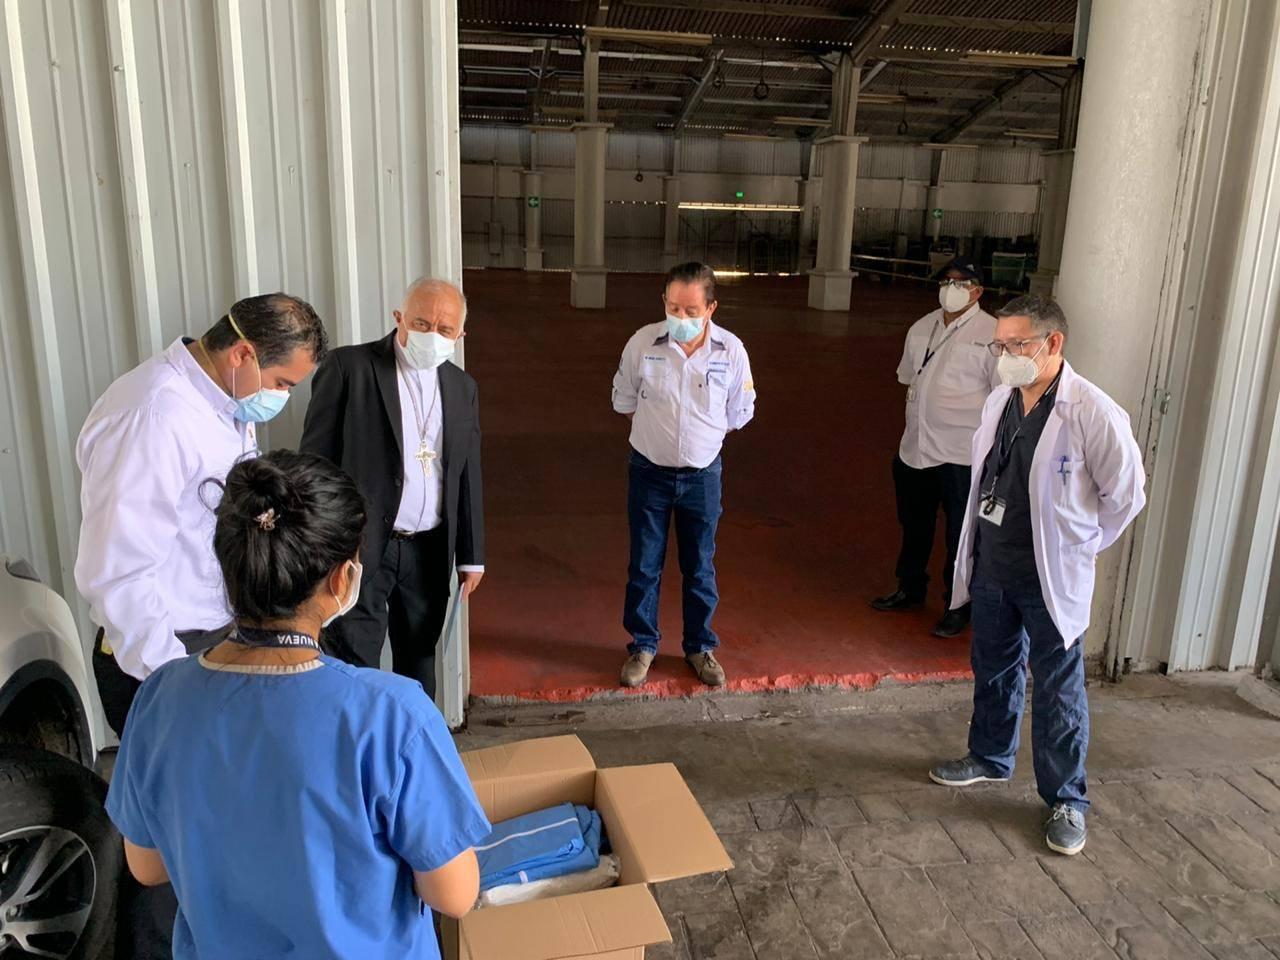 Cáritas Arquidiocesana donó más de 24 mil suministros médicos a hospital temporal